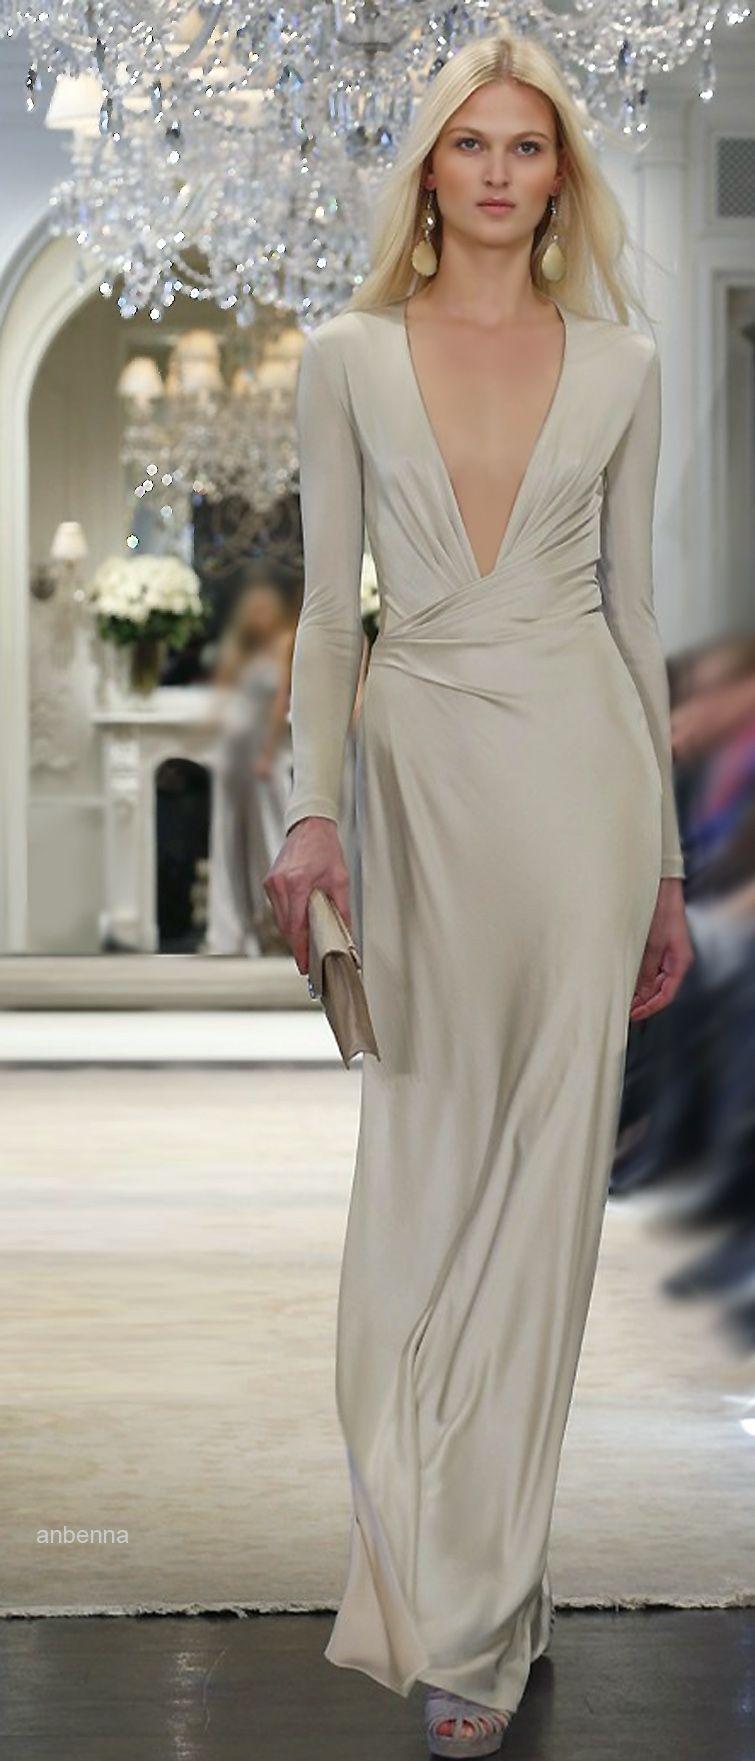 Rosamaria G Frangini |Haute Couture | Ralph Lauren Beige Dress ...